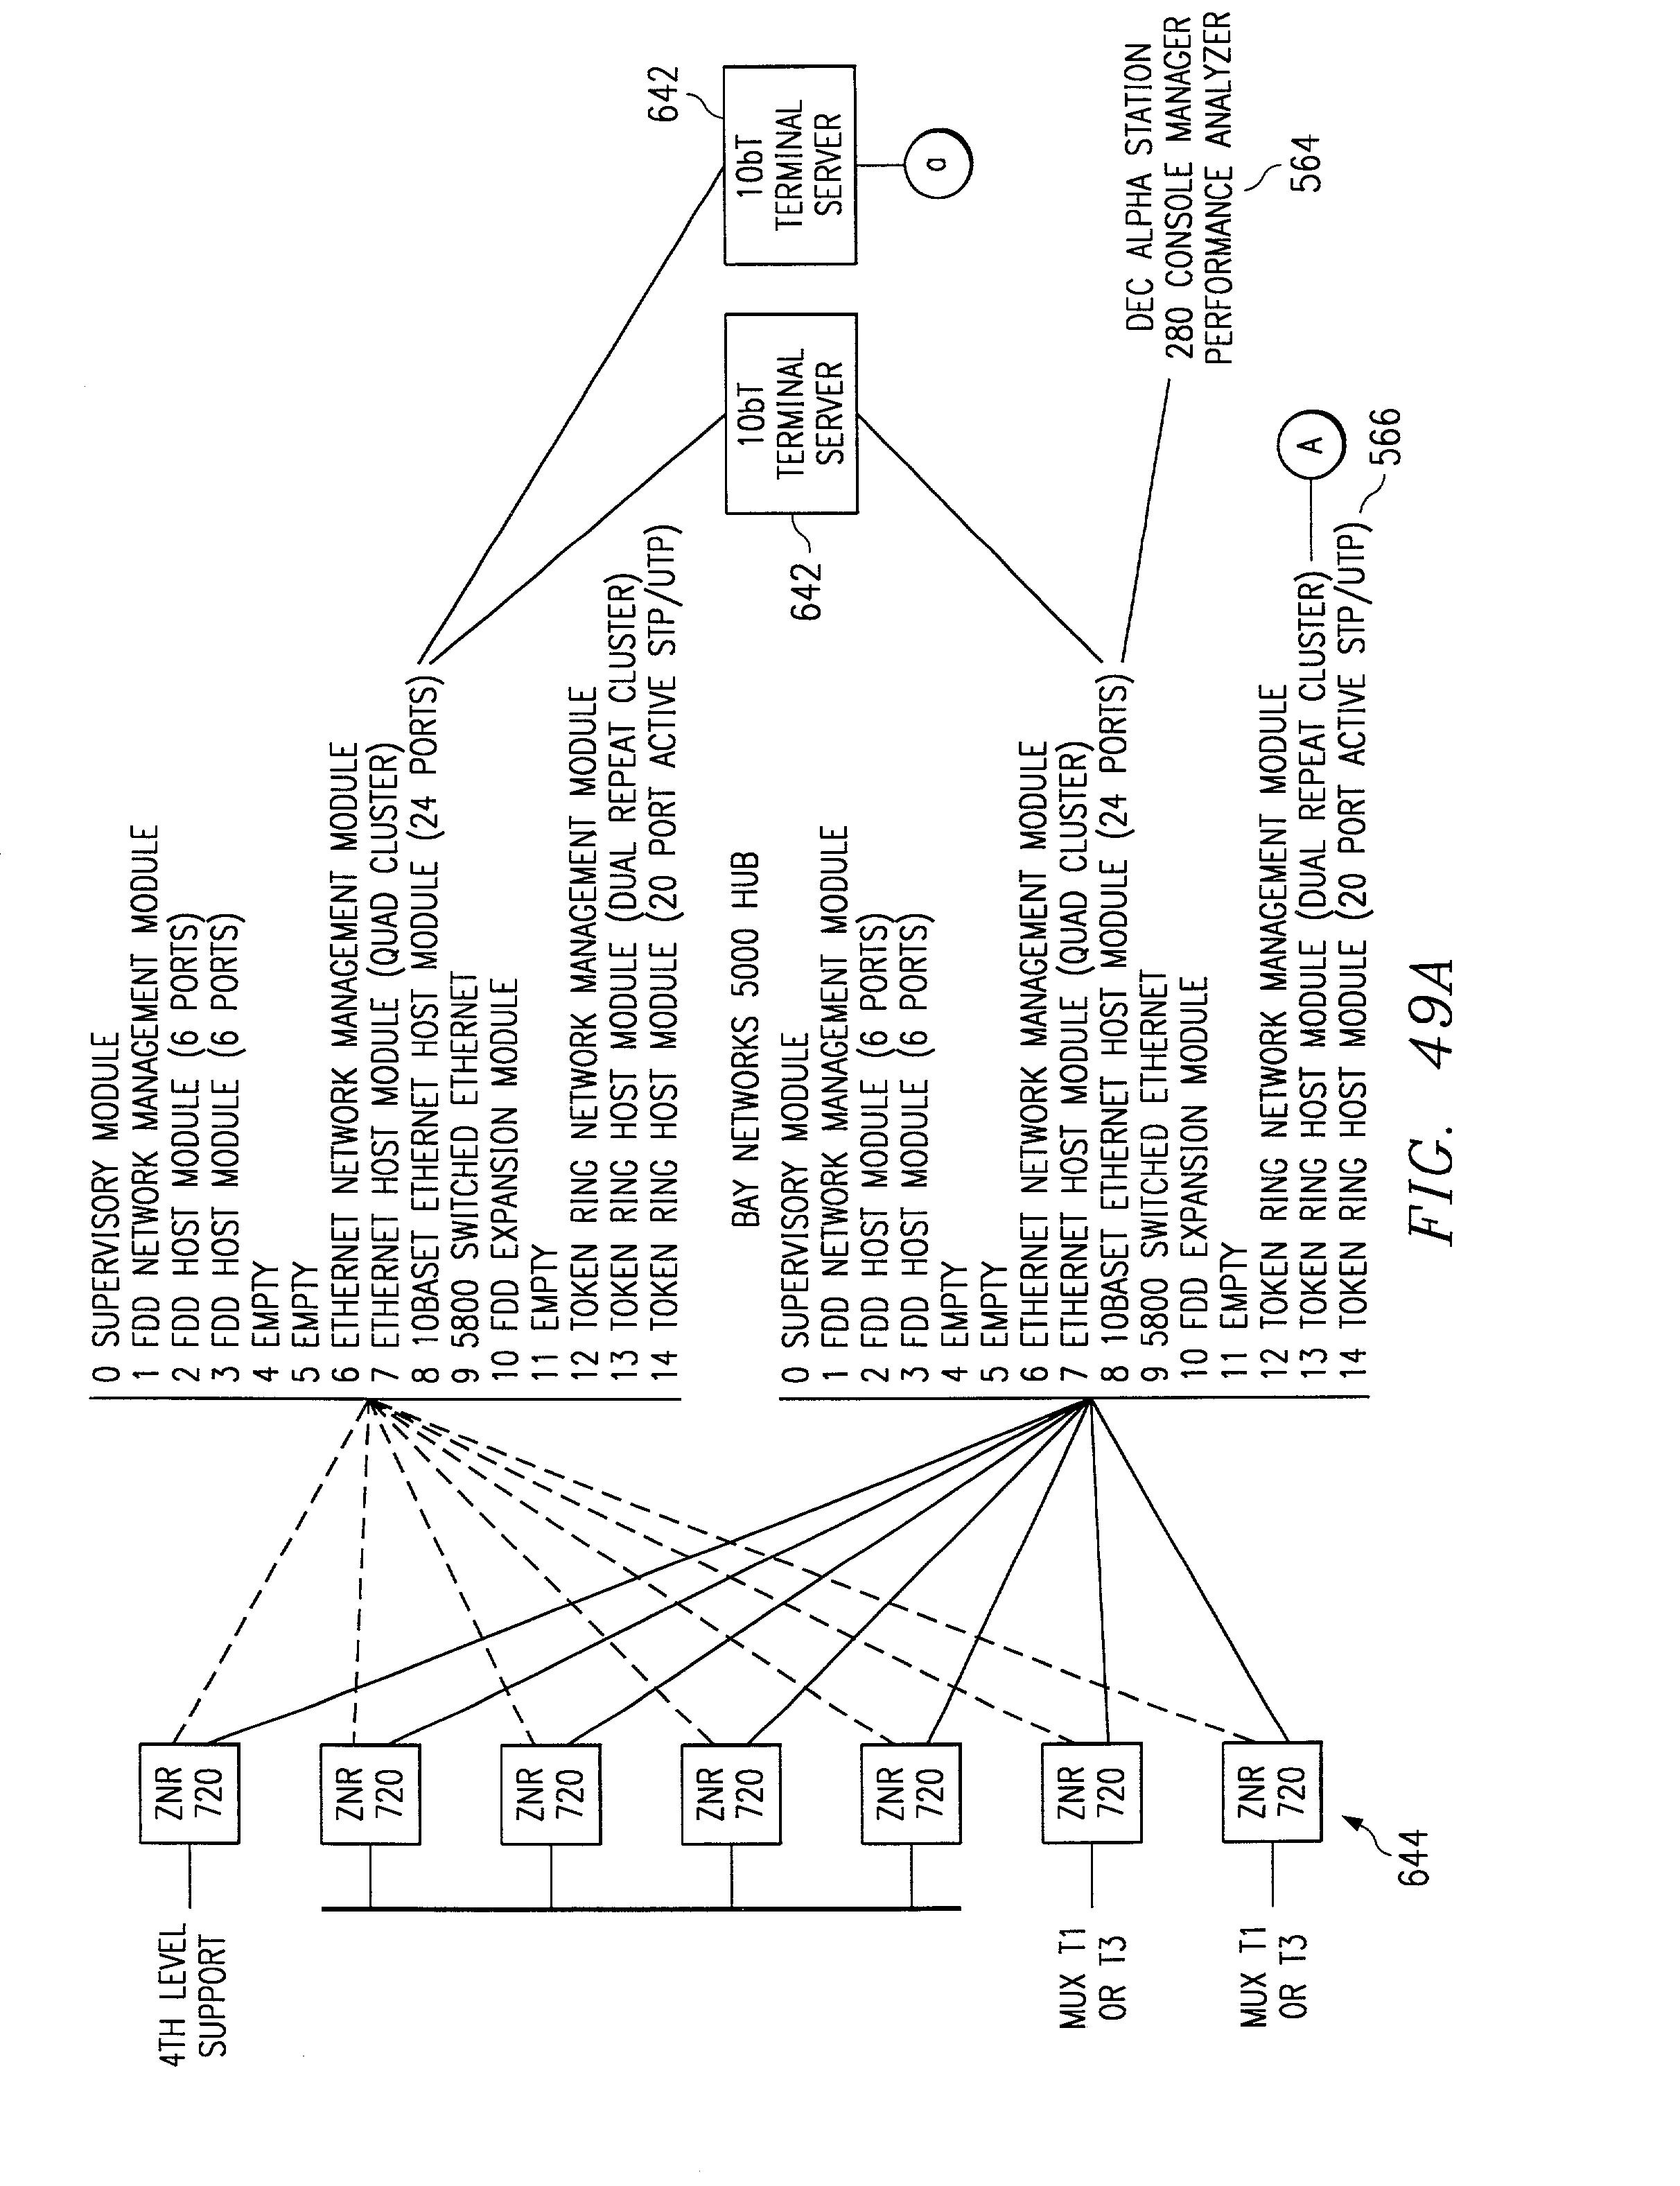 Patent Us 20020064149a1 Ibm 1620 Programming Manual On Physical Terminal Block Wiring Diagram Images